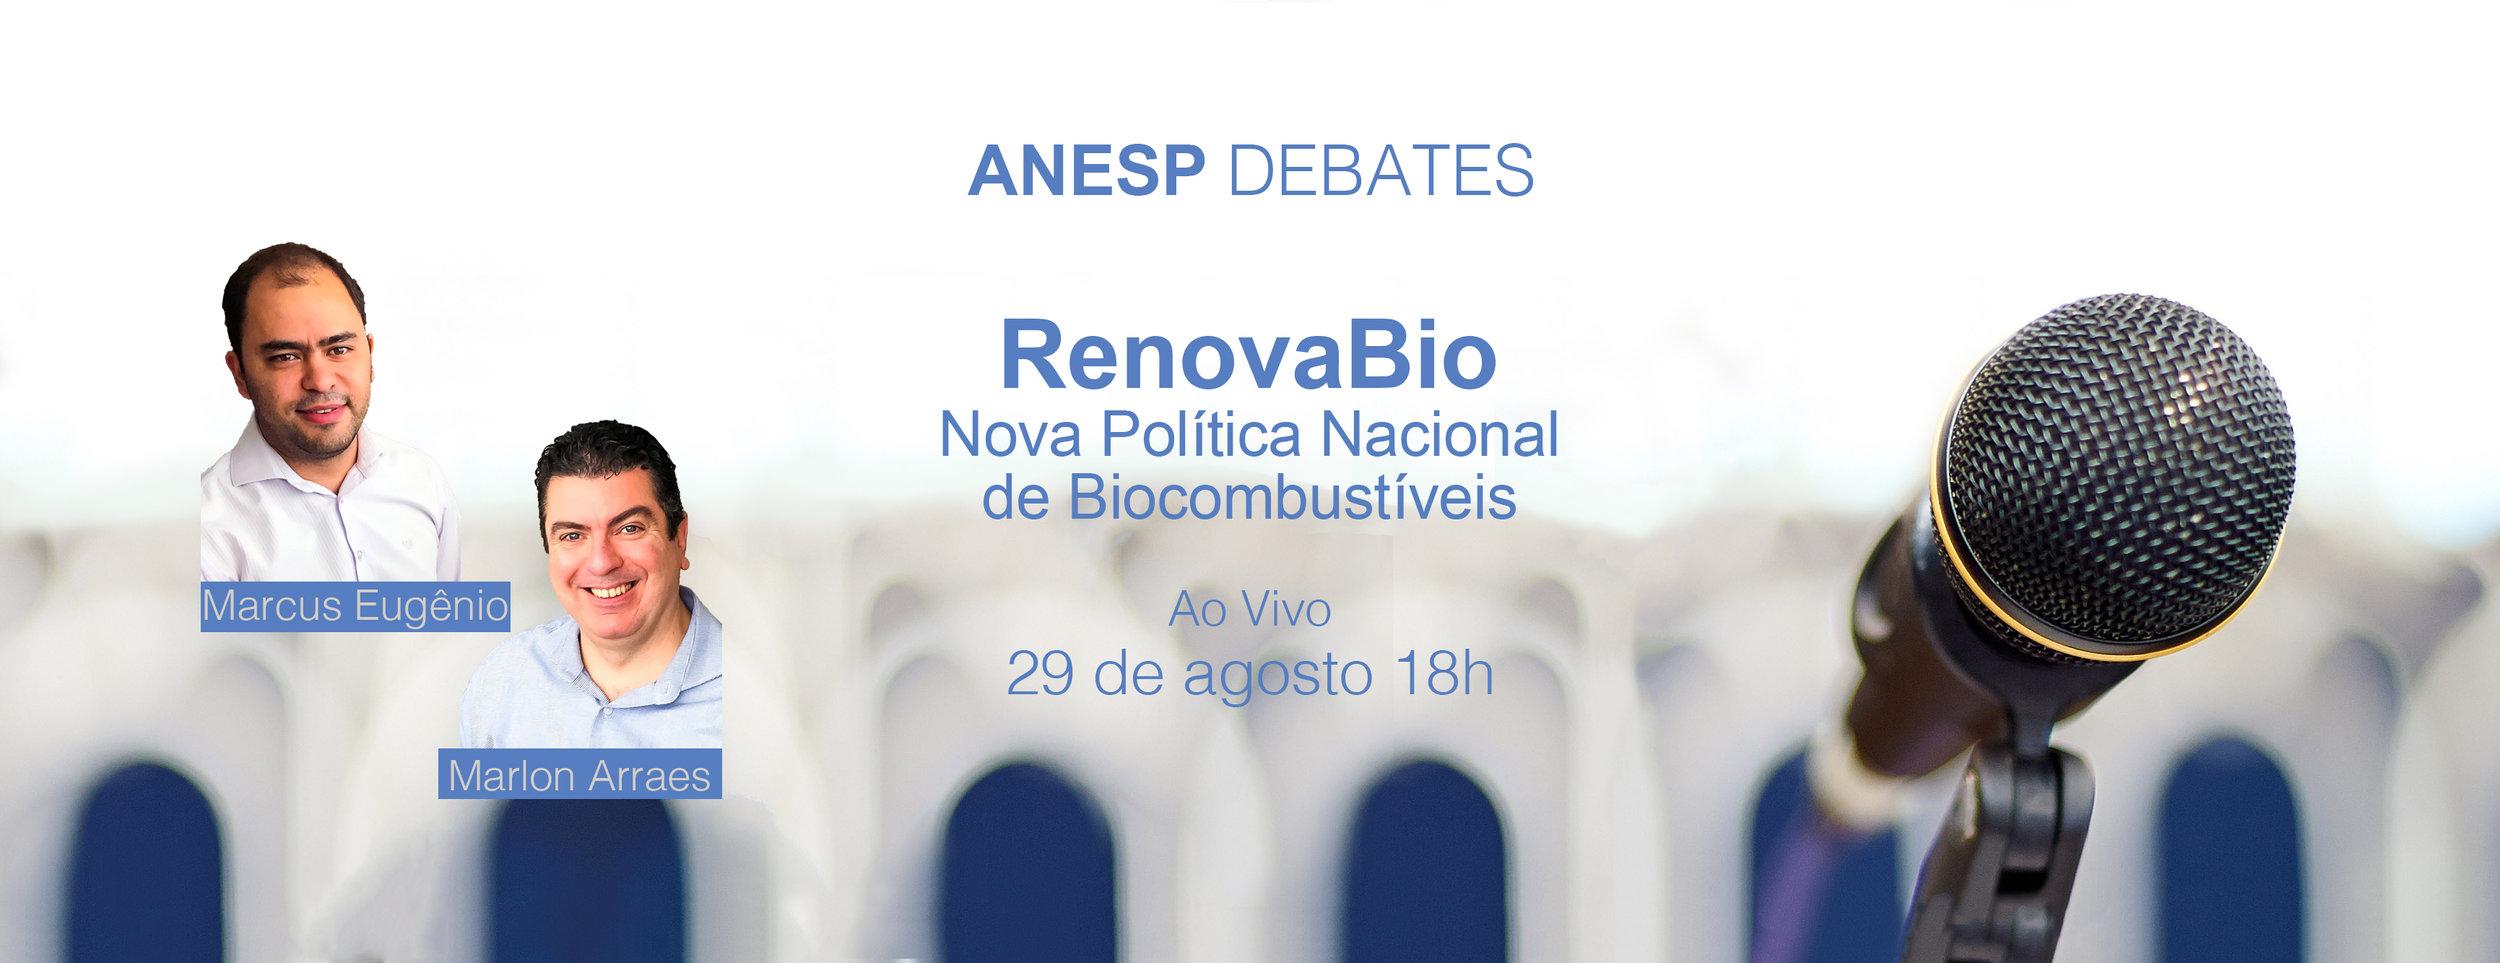 dest ANESP Debates - RenovaBio.jpg